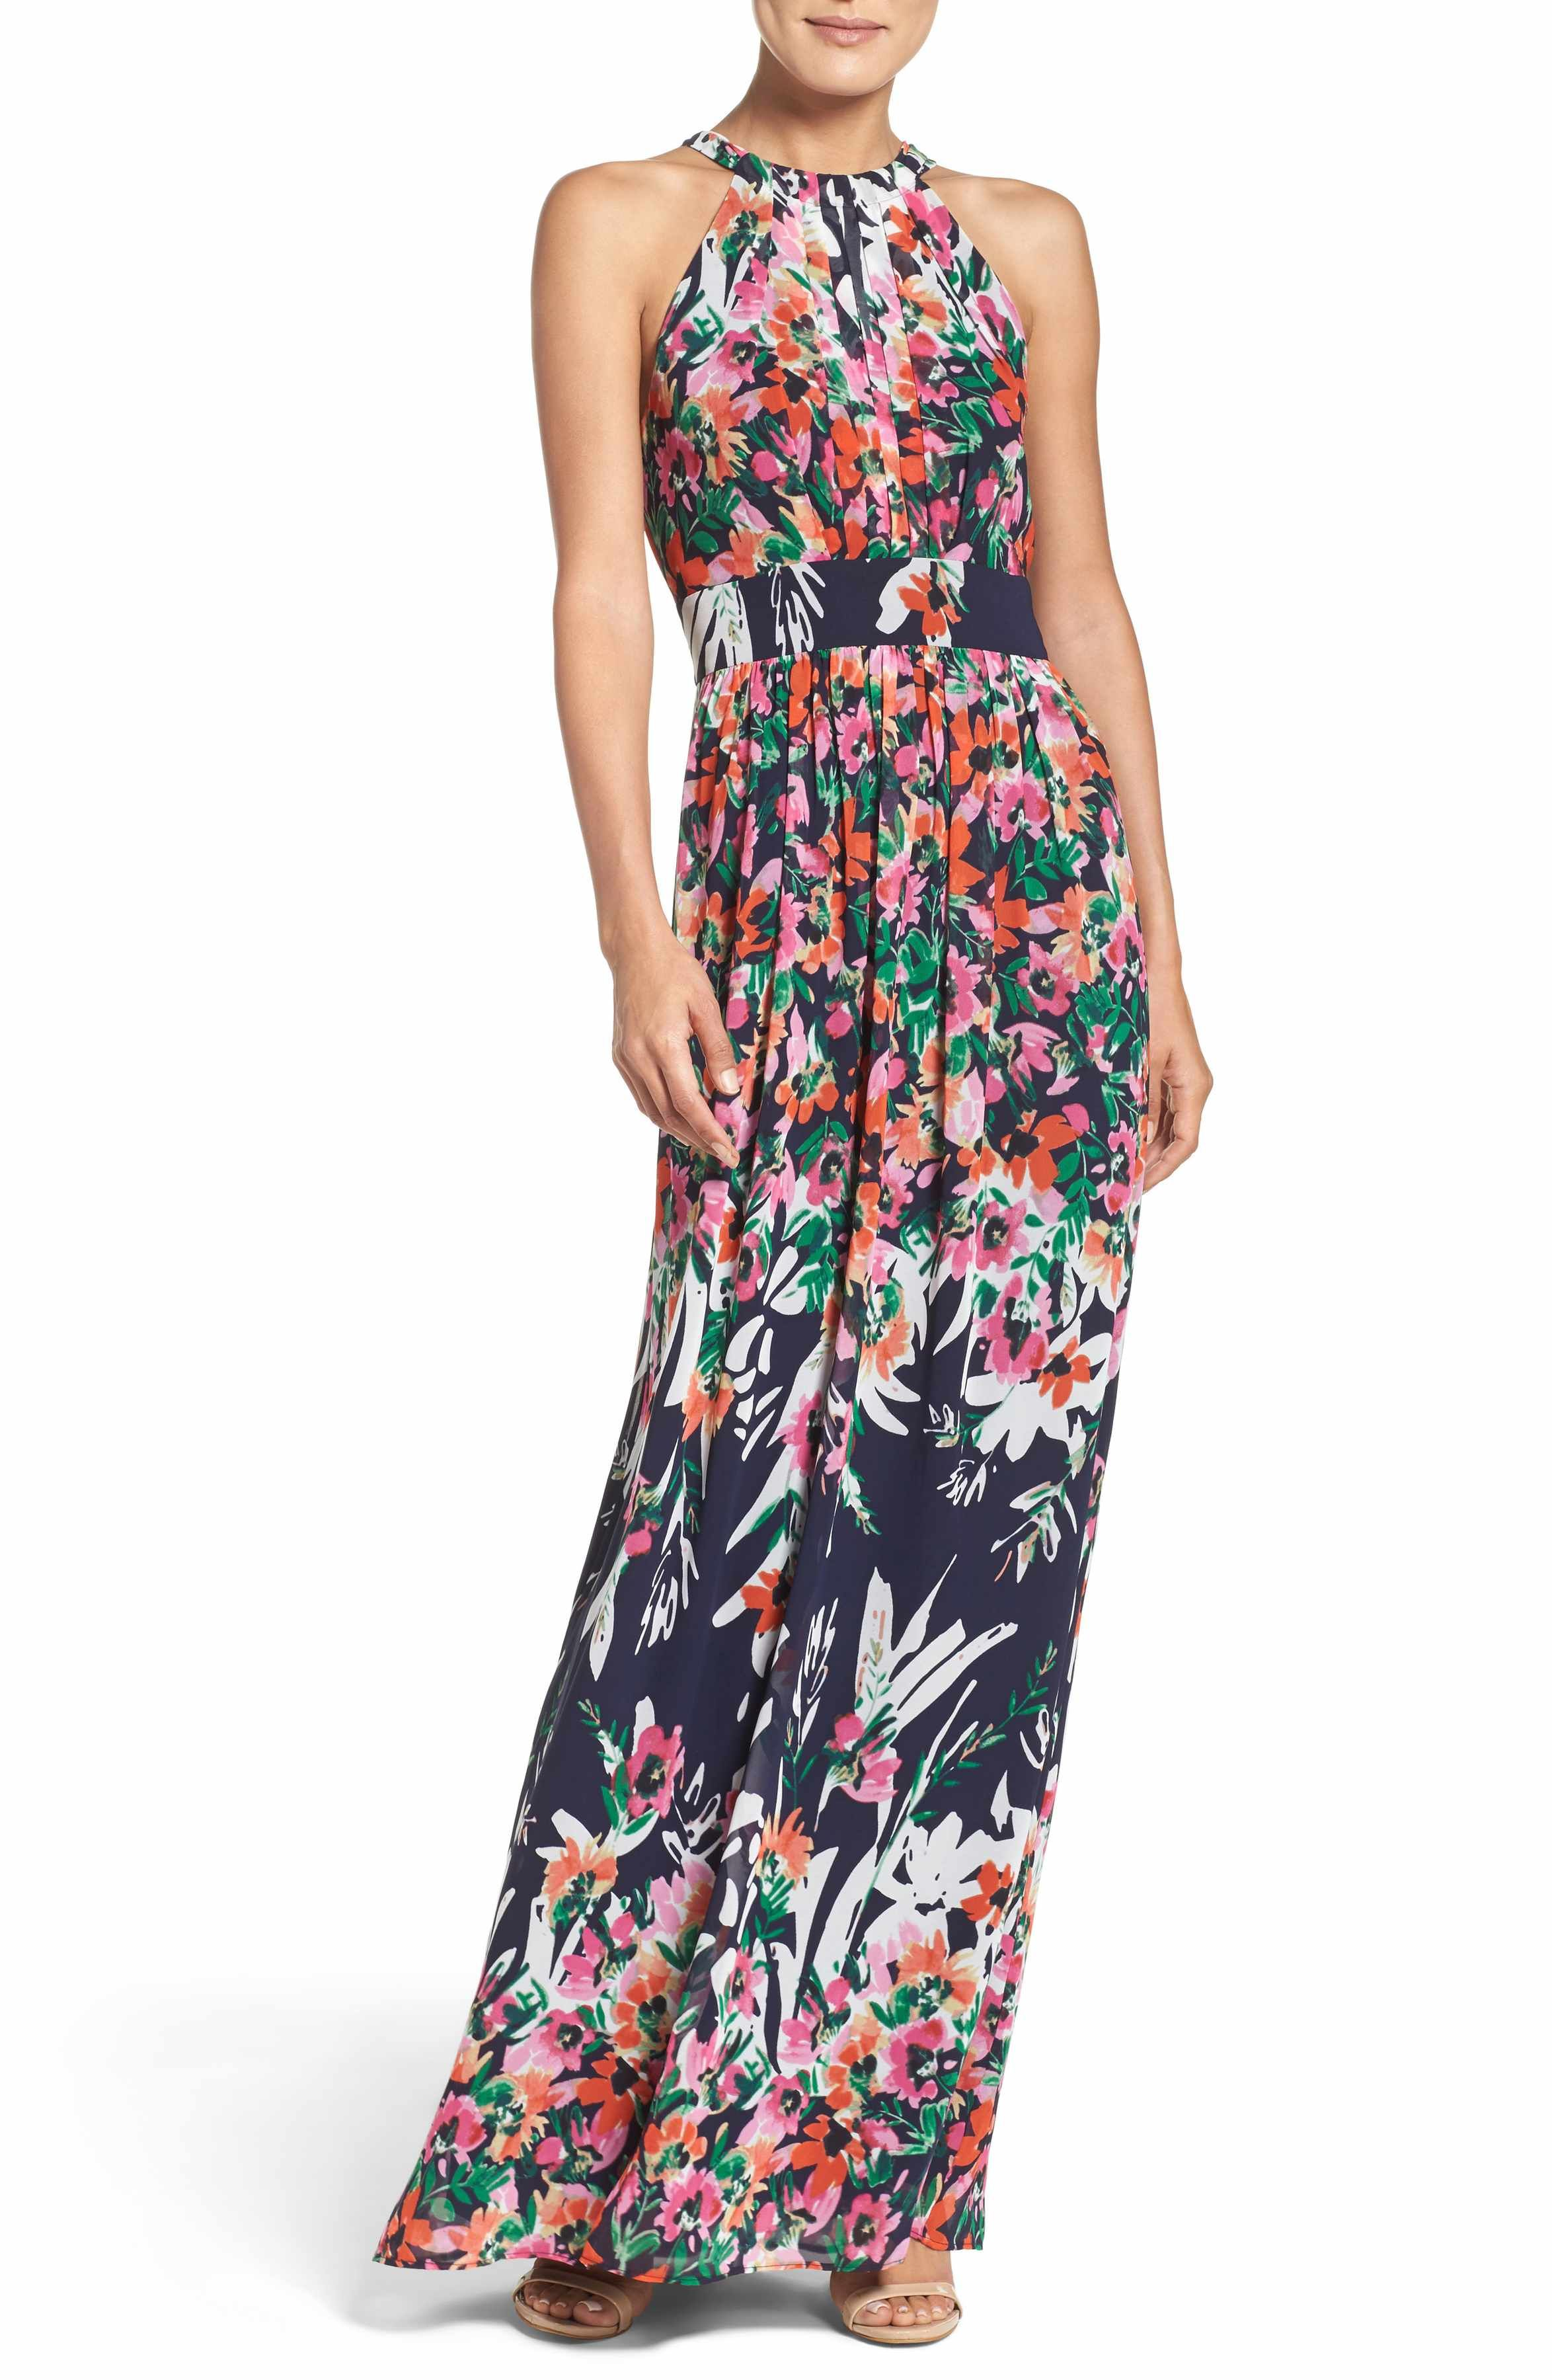 8b5537cc6d4 Main Image - Eliza J Print Chiffon Halter Maxi Dress